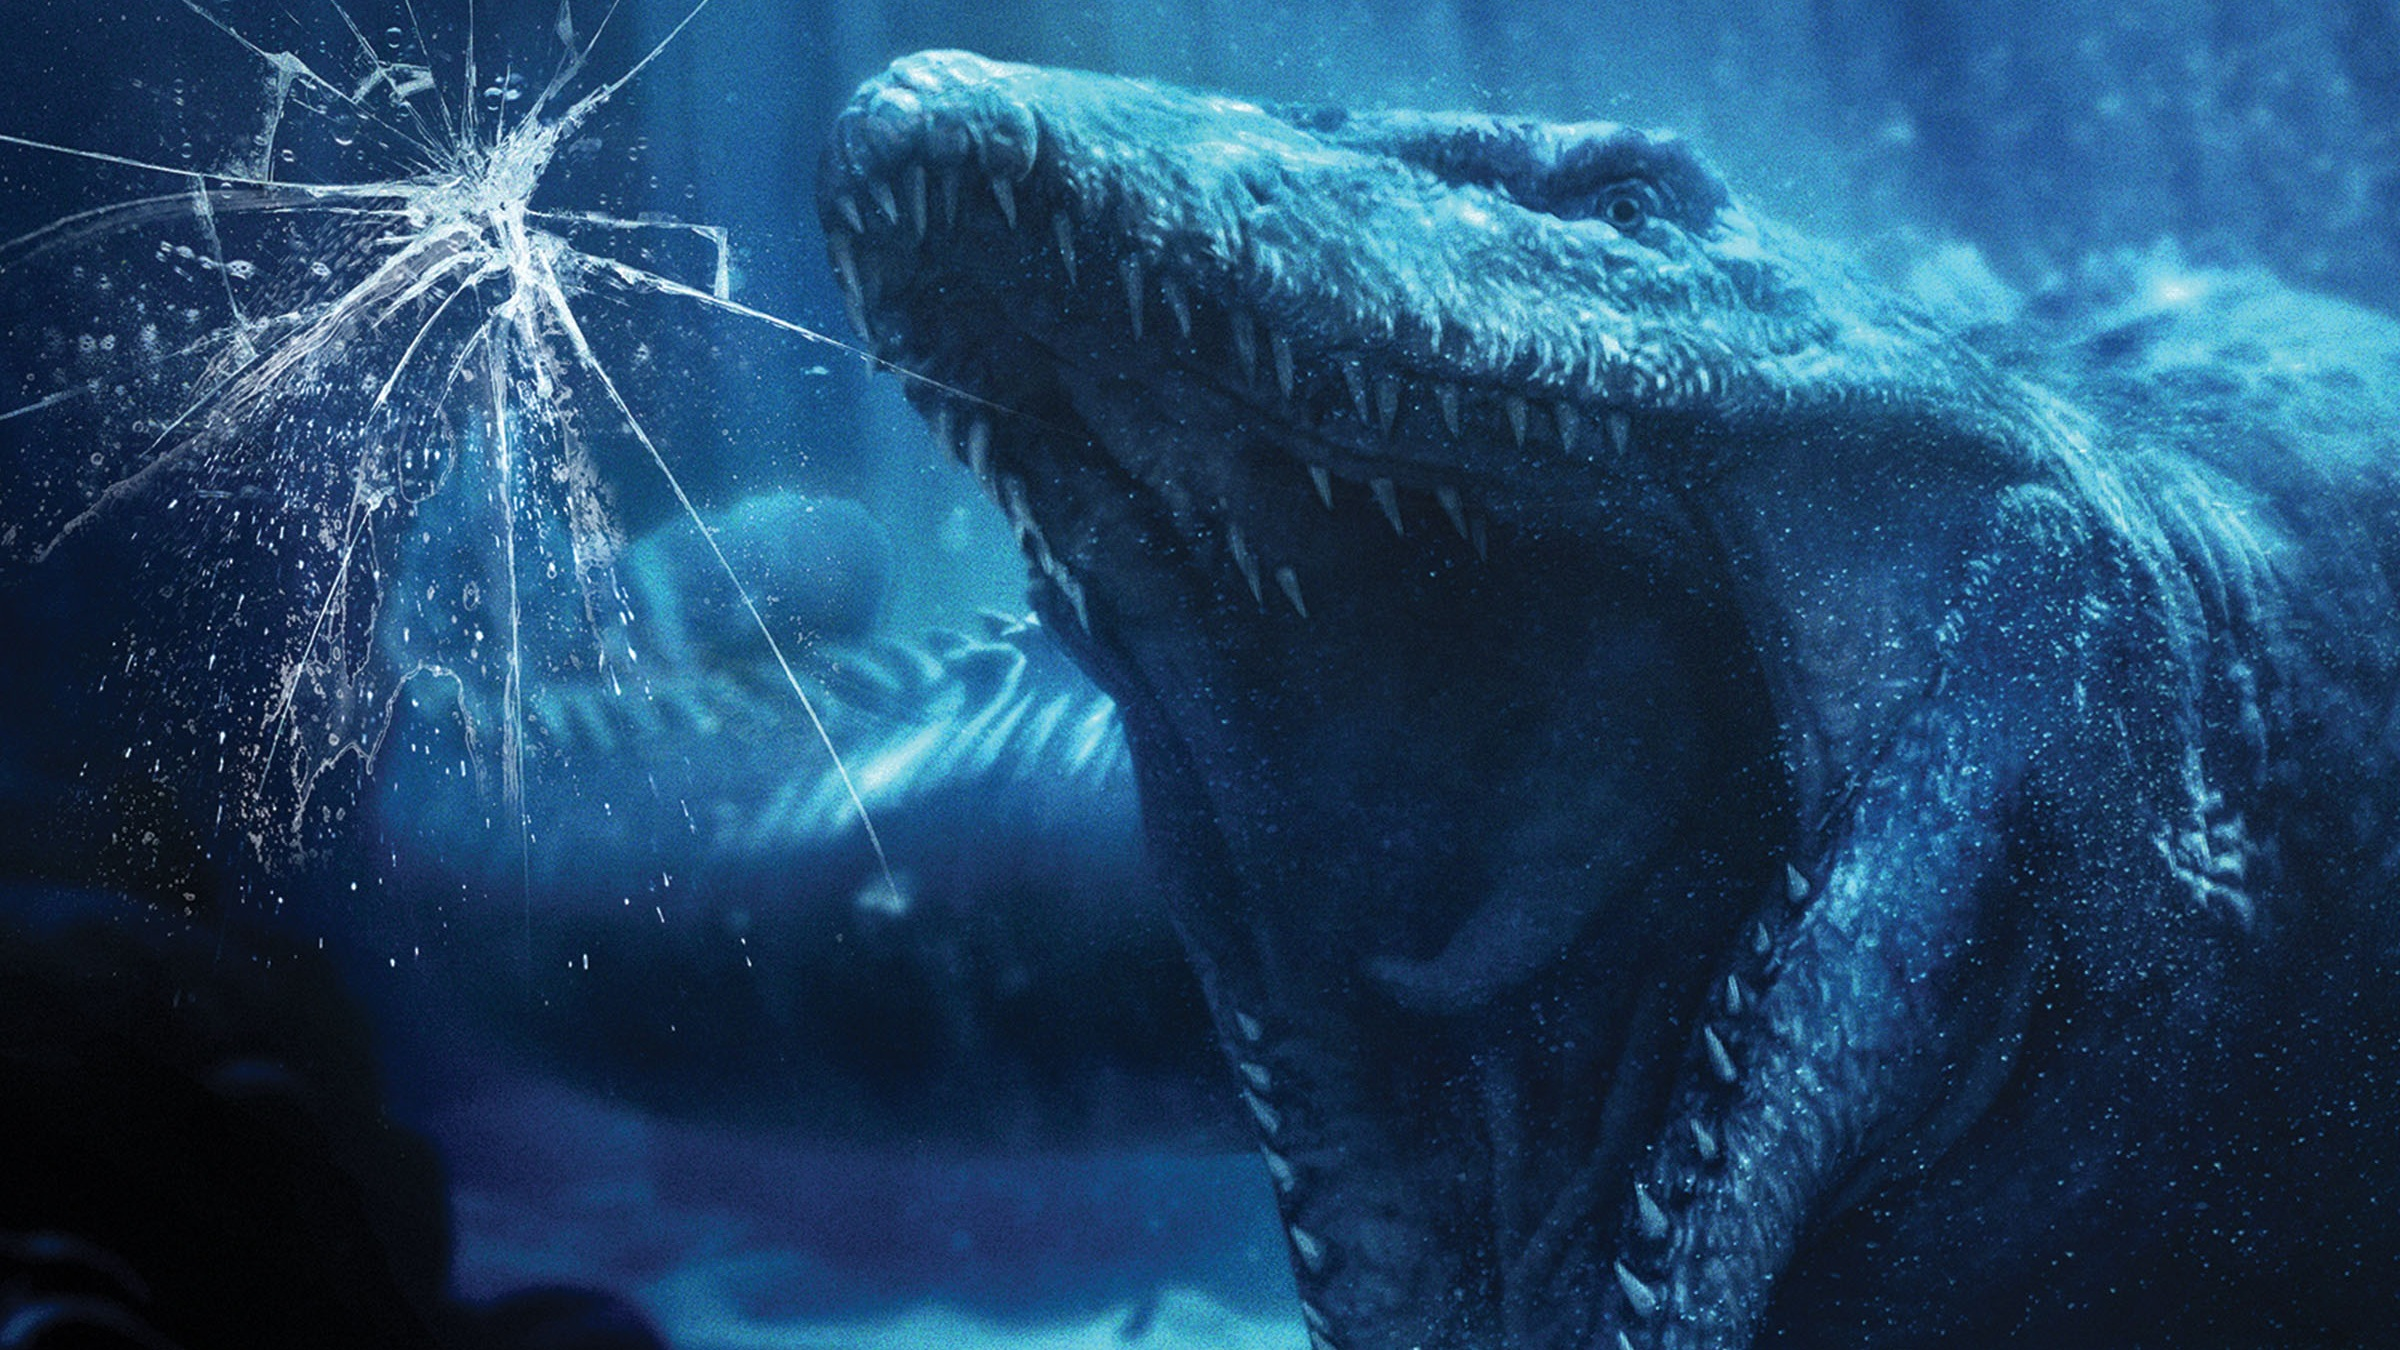 Mosasauraus+in+Aquarium+Observatory+Tank-Jurassic+World-The+Ride+at++USH.jpg